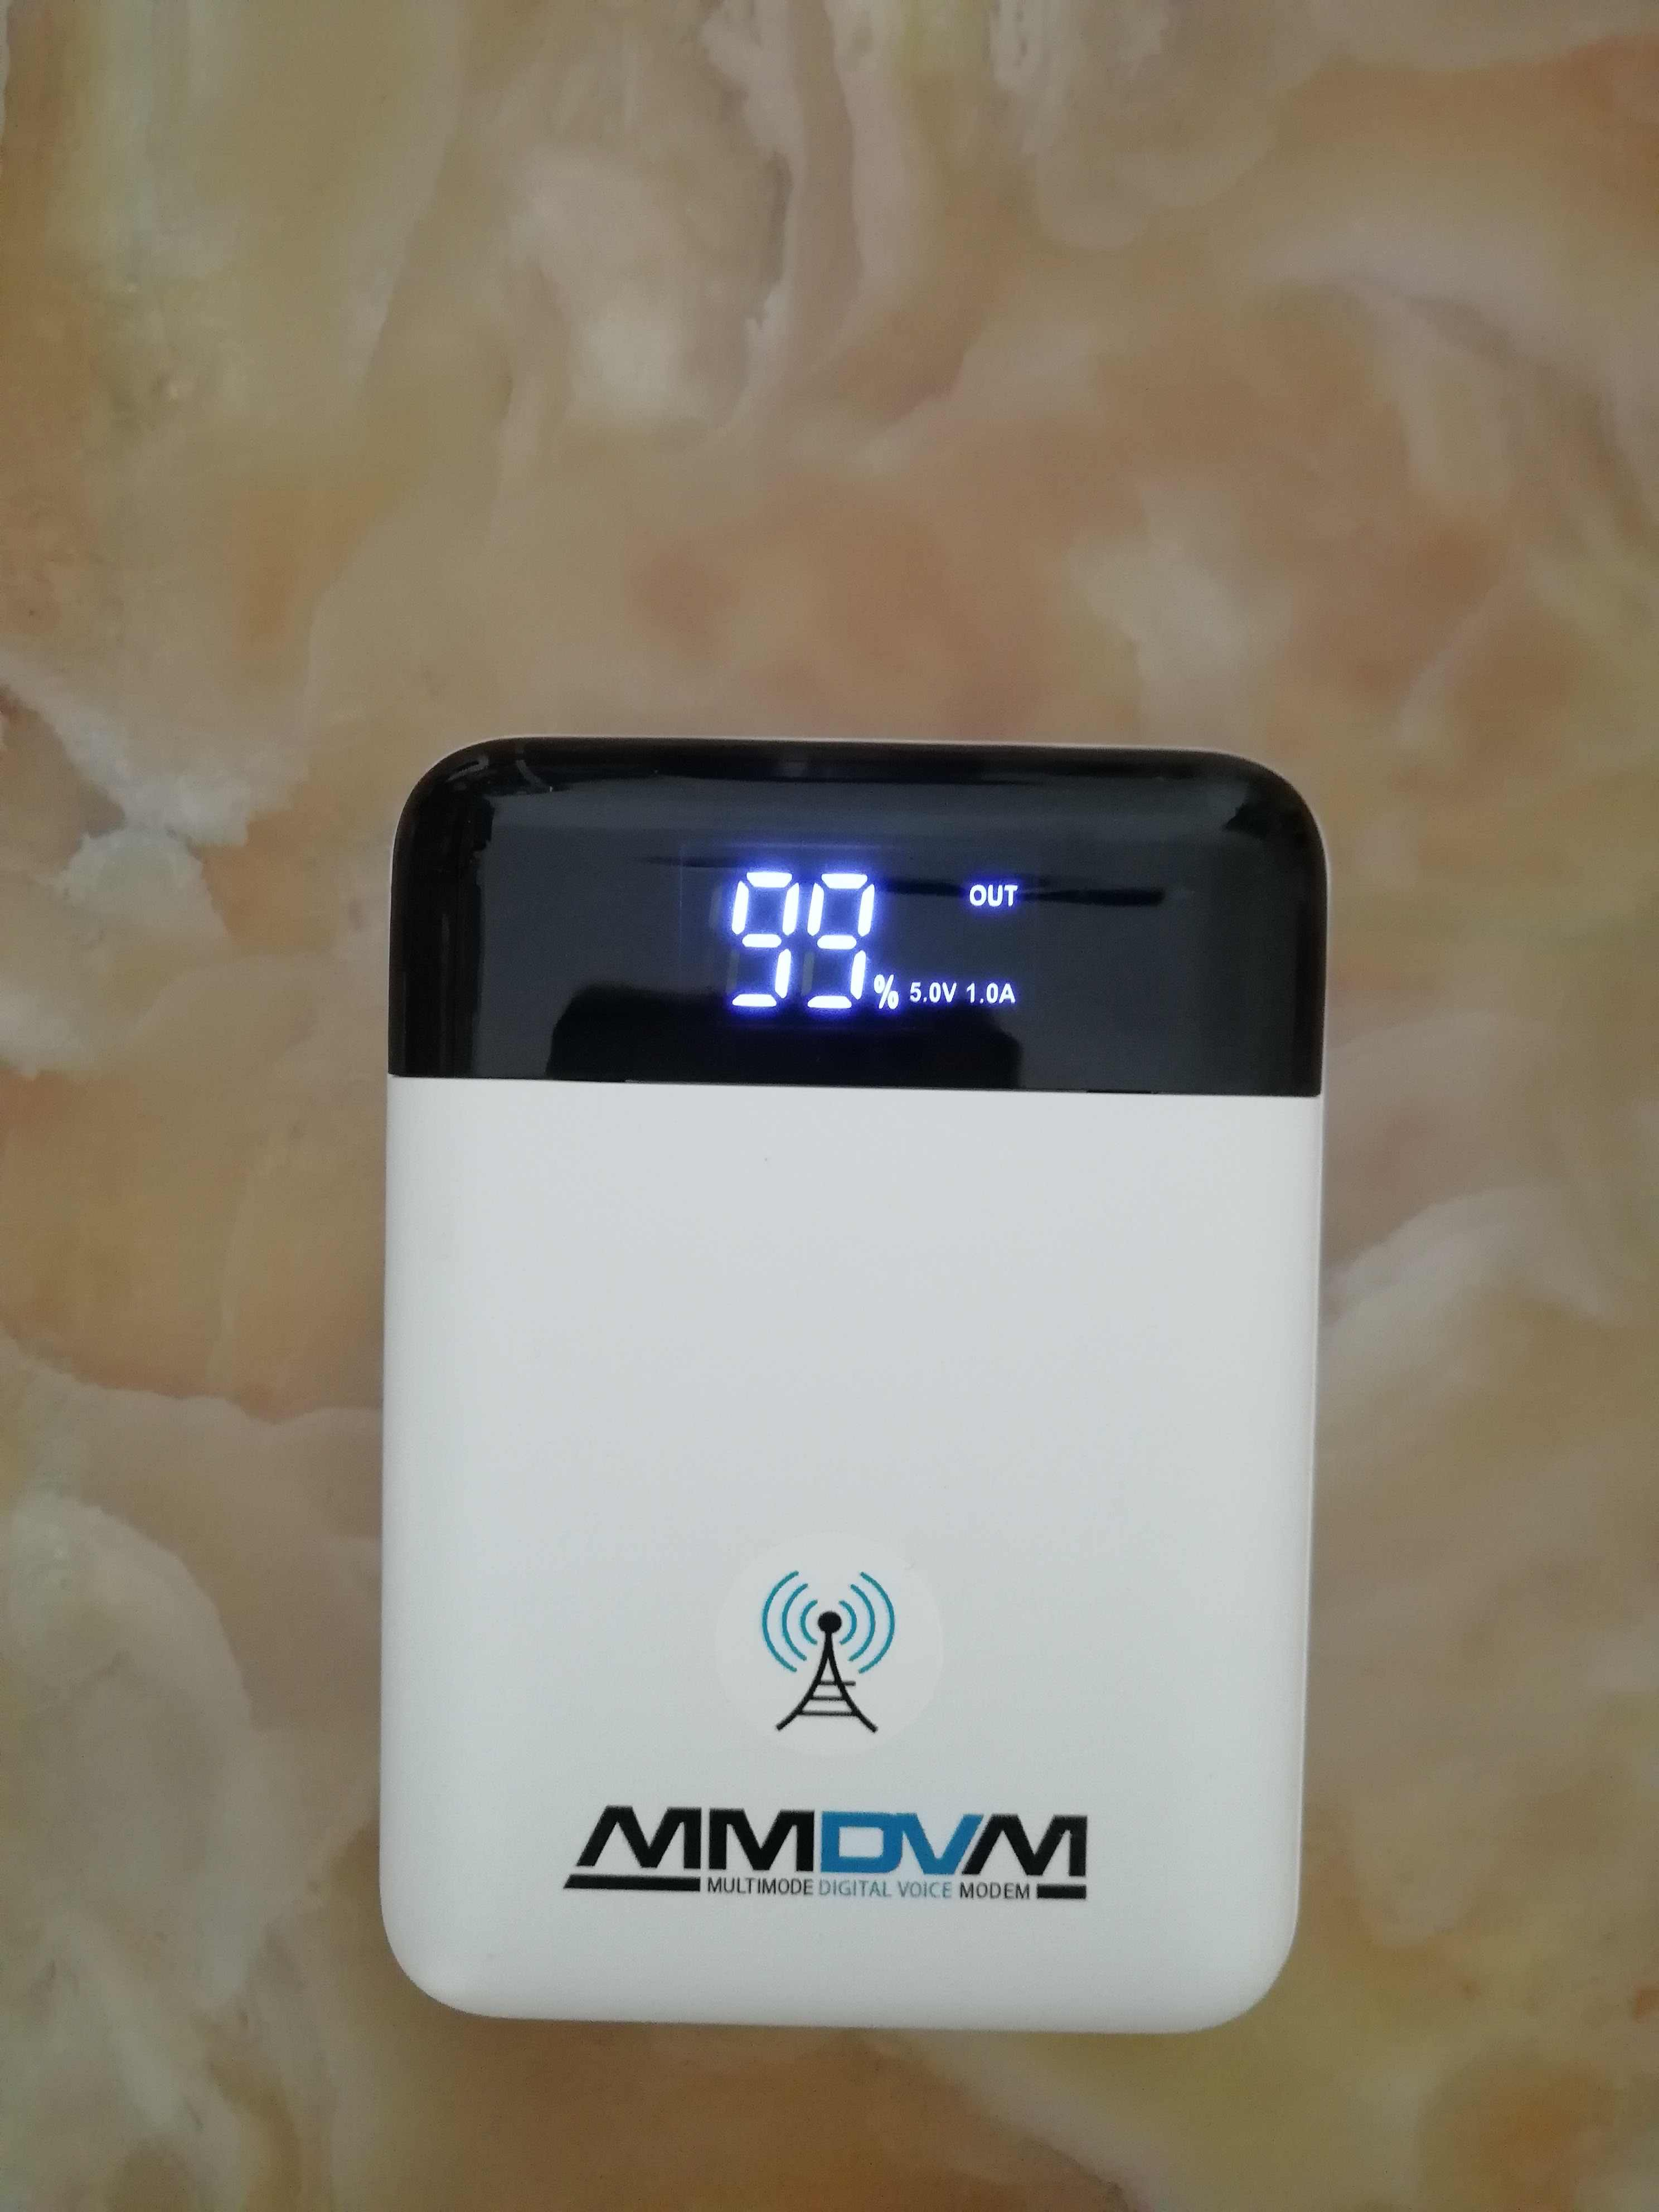 Simplex Portable hotSPOT MMDVM(built in battery) DMR/YSF/P25